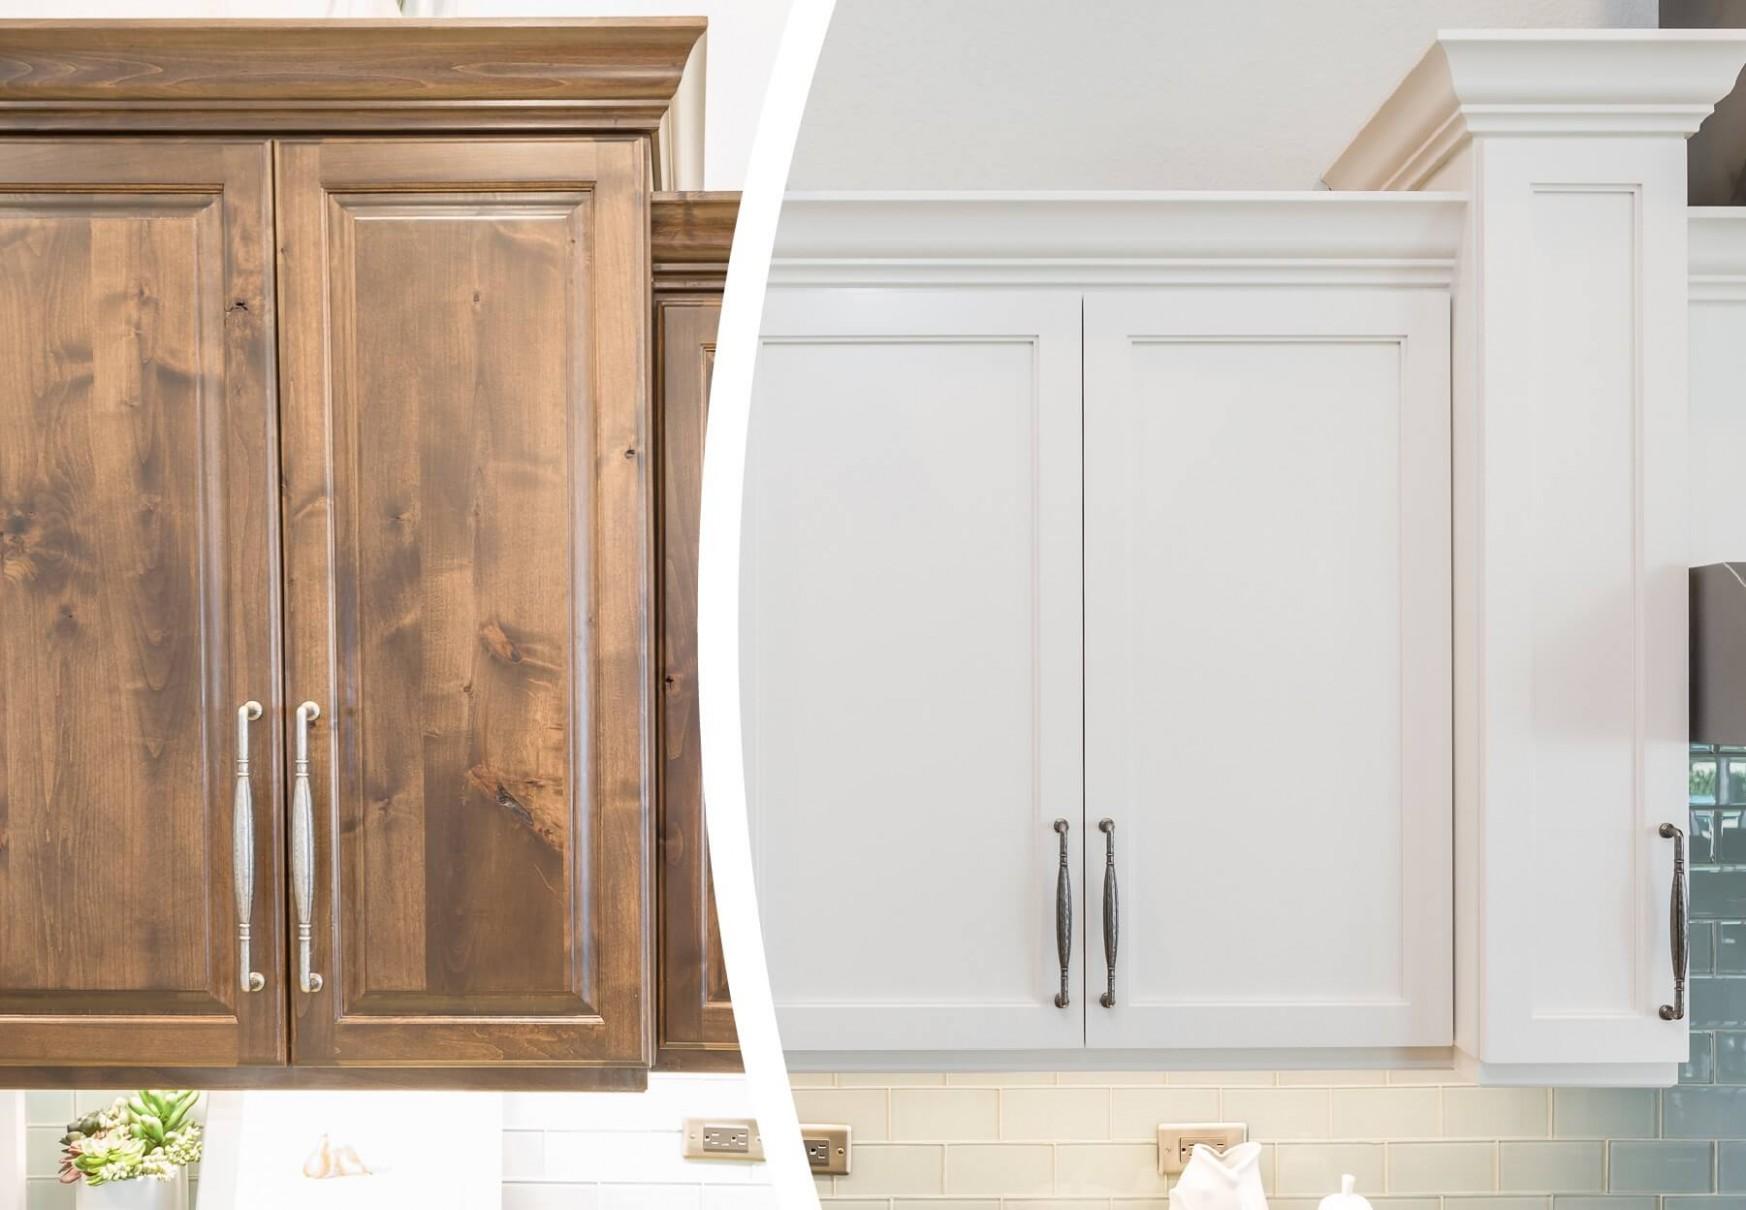 Kitchen Cabinet Refacing  NHance Niagara ꟾ Kitchen Cabinet  - Kitchen Cabinet Refacing Niagara Falls